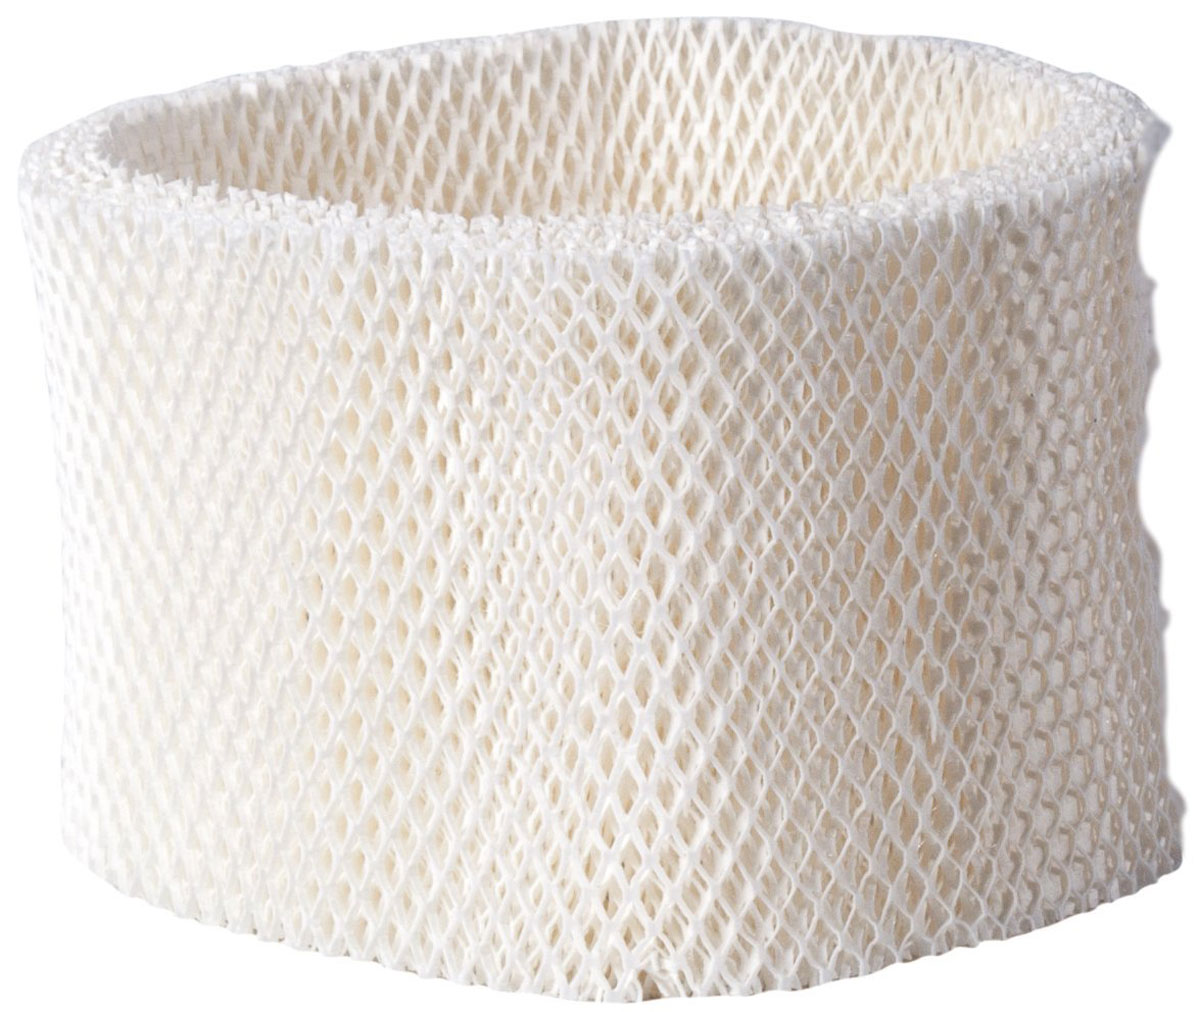 Boneco A7018 Filter Matt фильтр увлажняющий для E2441 фильтр boneco allergy filter a401